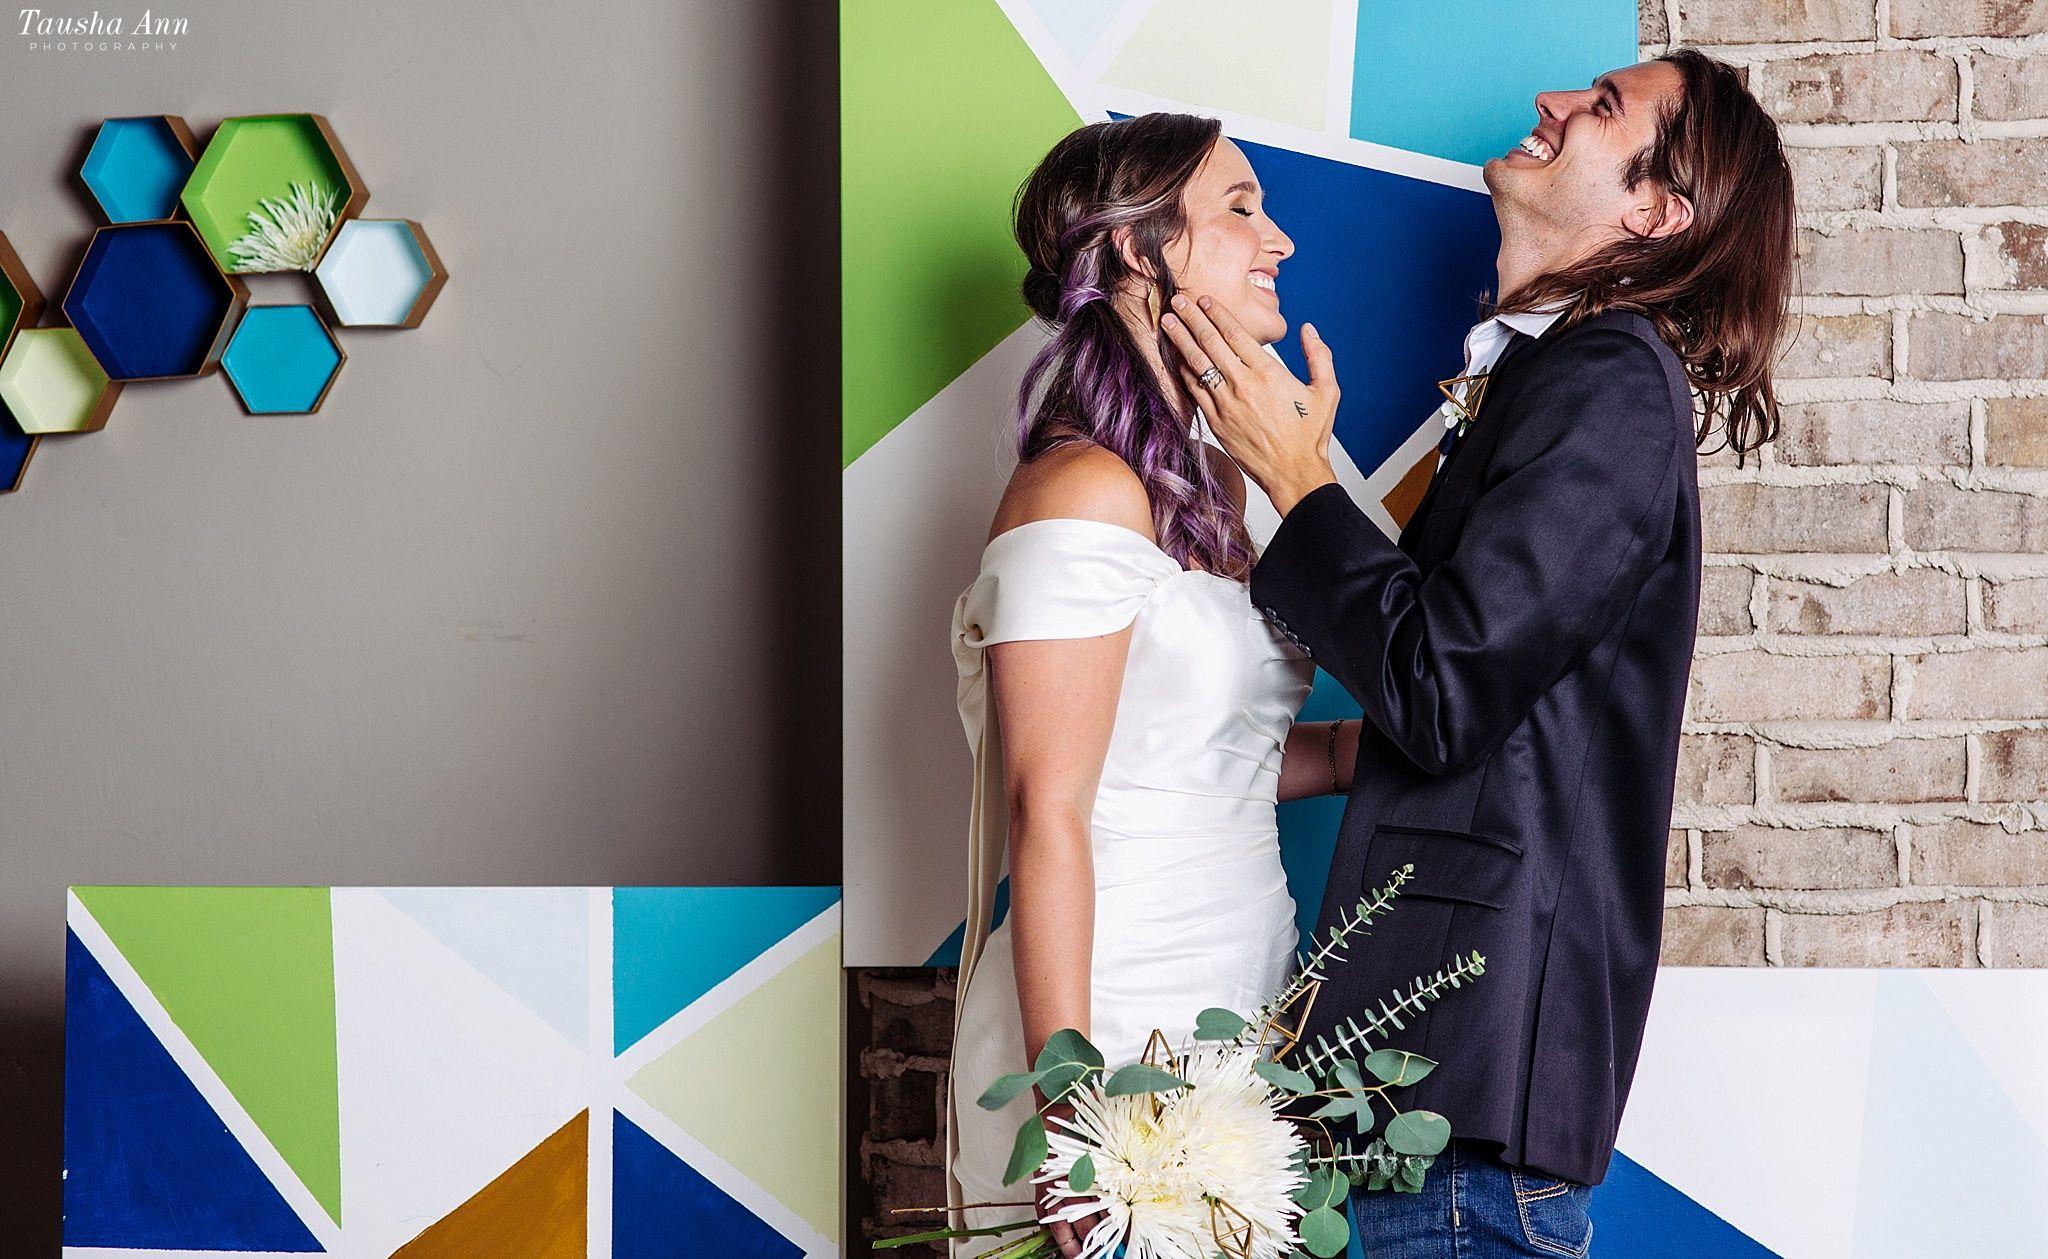 Tausha Ann Photography | Nashville TN Wedding Photographer » Geometric Wedding Styled Shoot | Modern Wedding Inspiration | Nashville TN Wedding Photographer - Tausha Ann Photography | Nashville TN Wedding Photographer